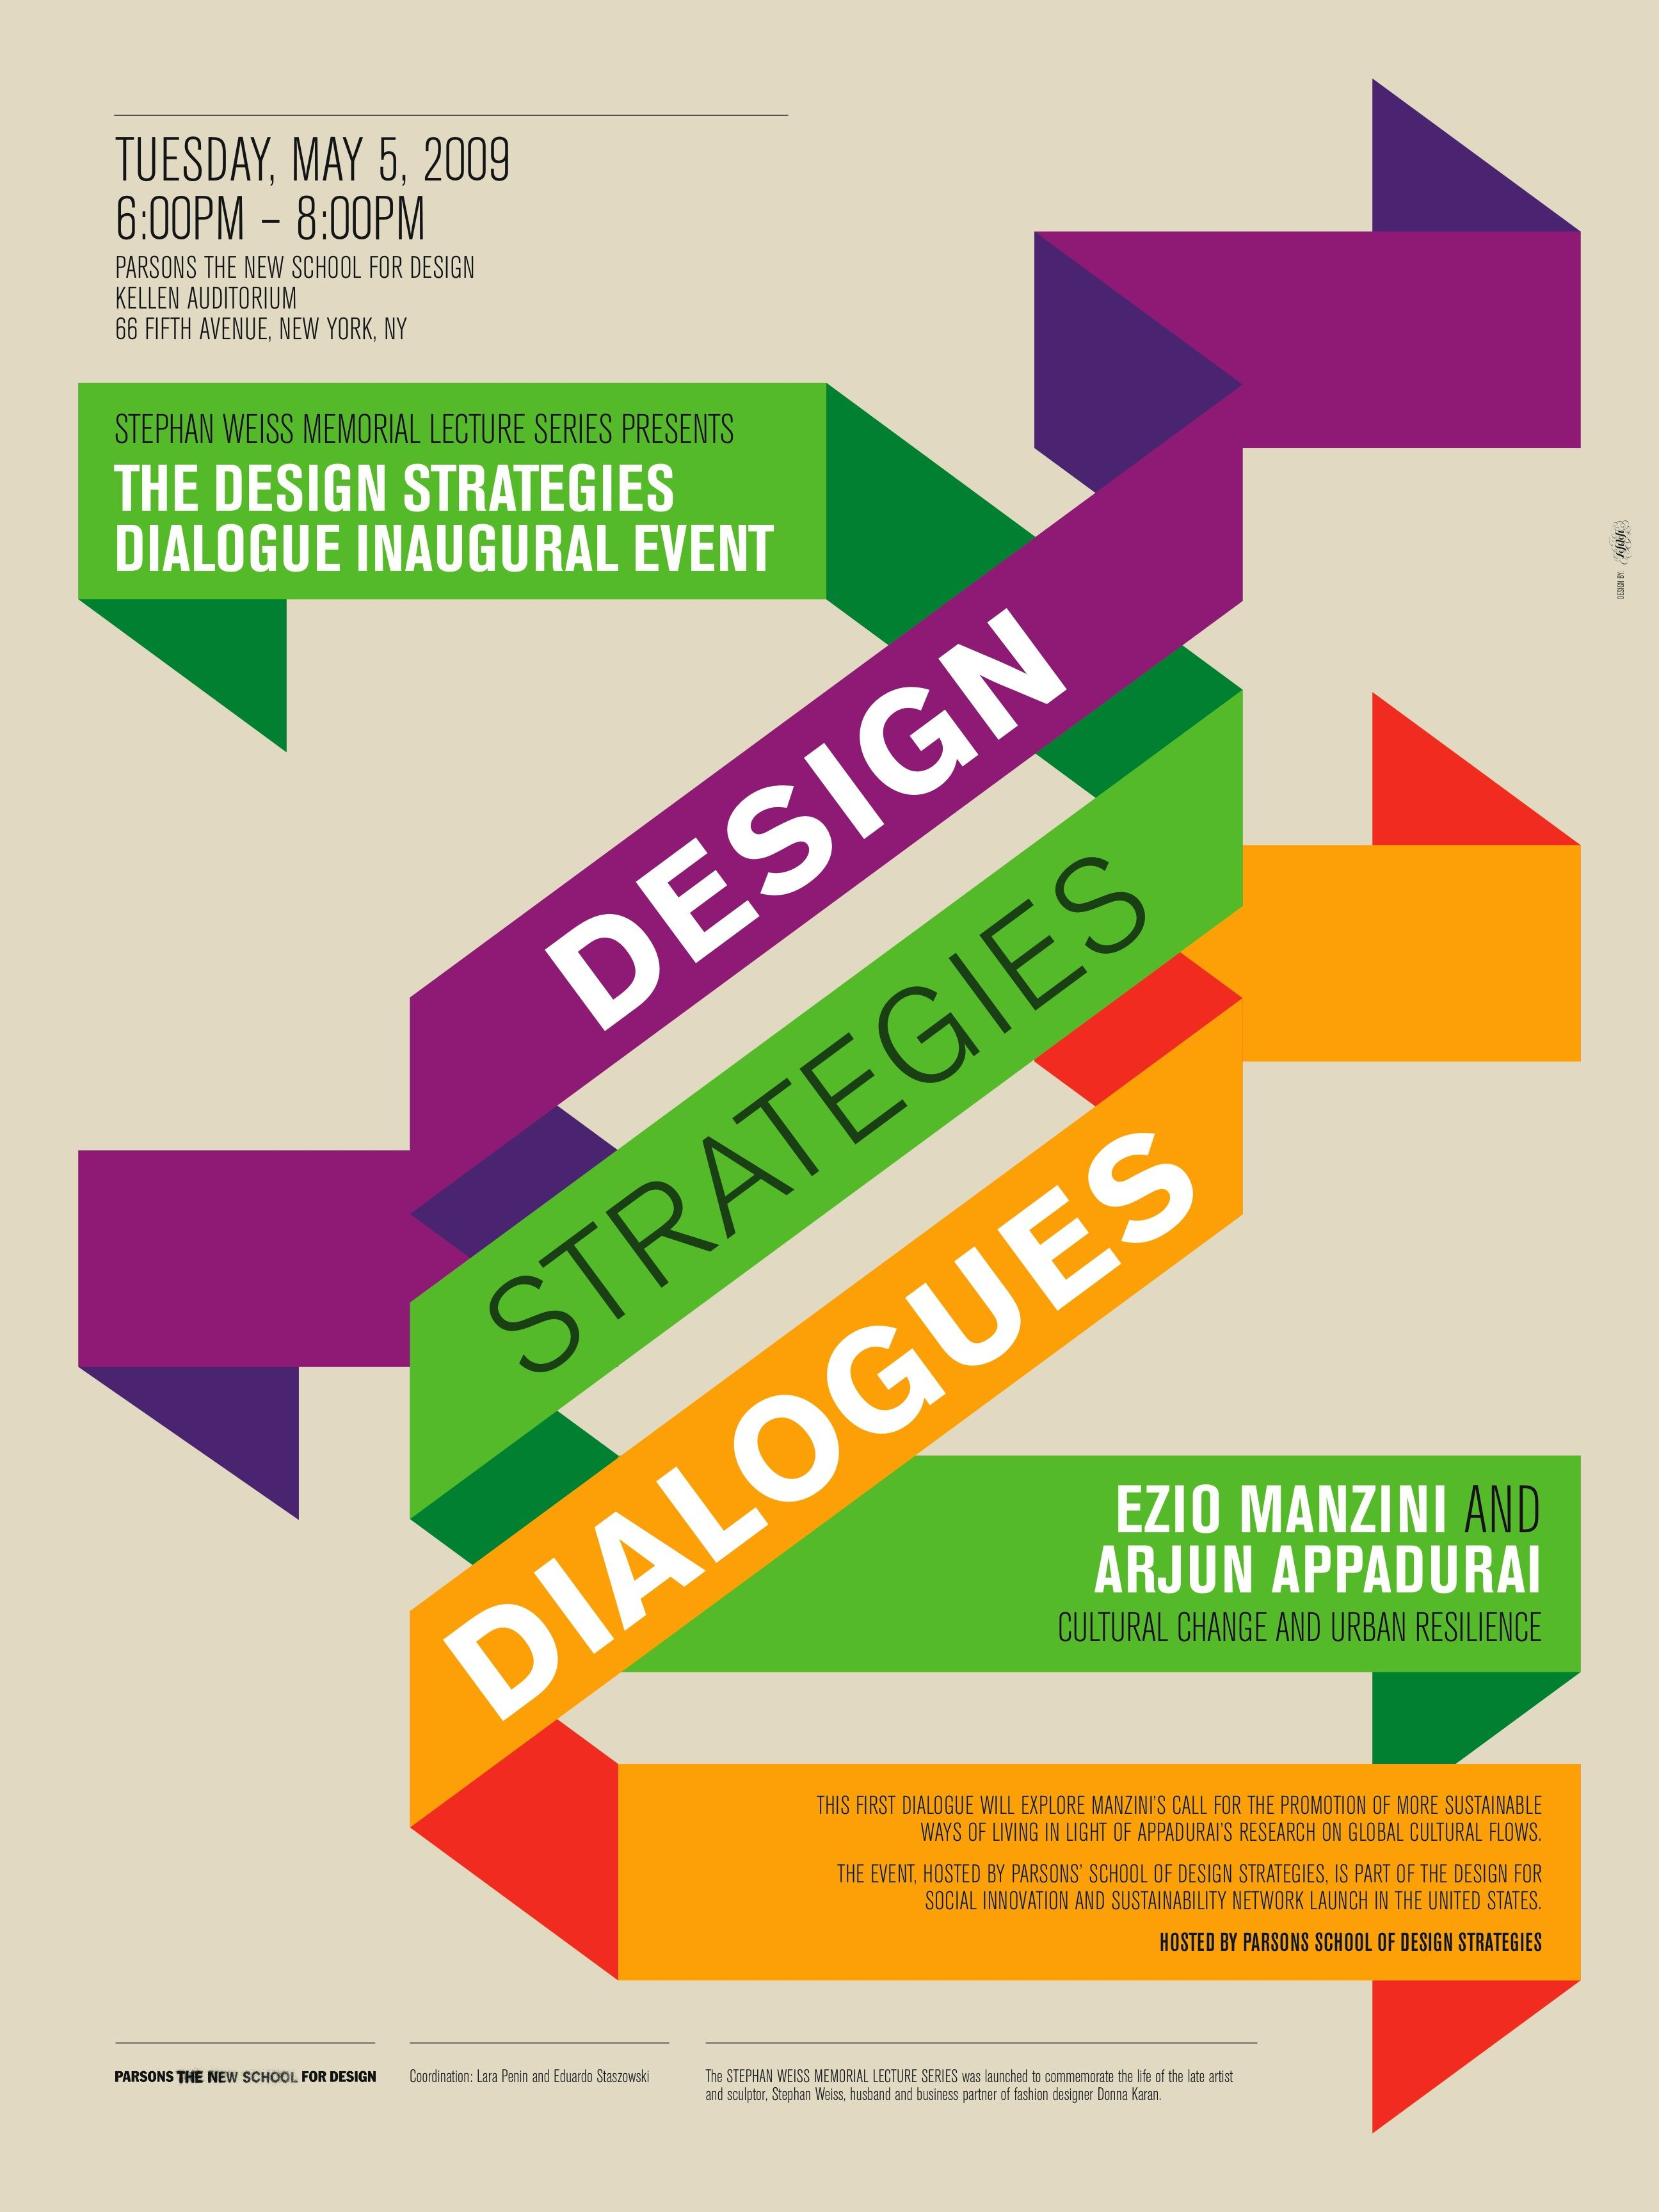 pin by jane thompson on design inspiration | pinterest | design